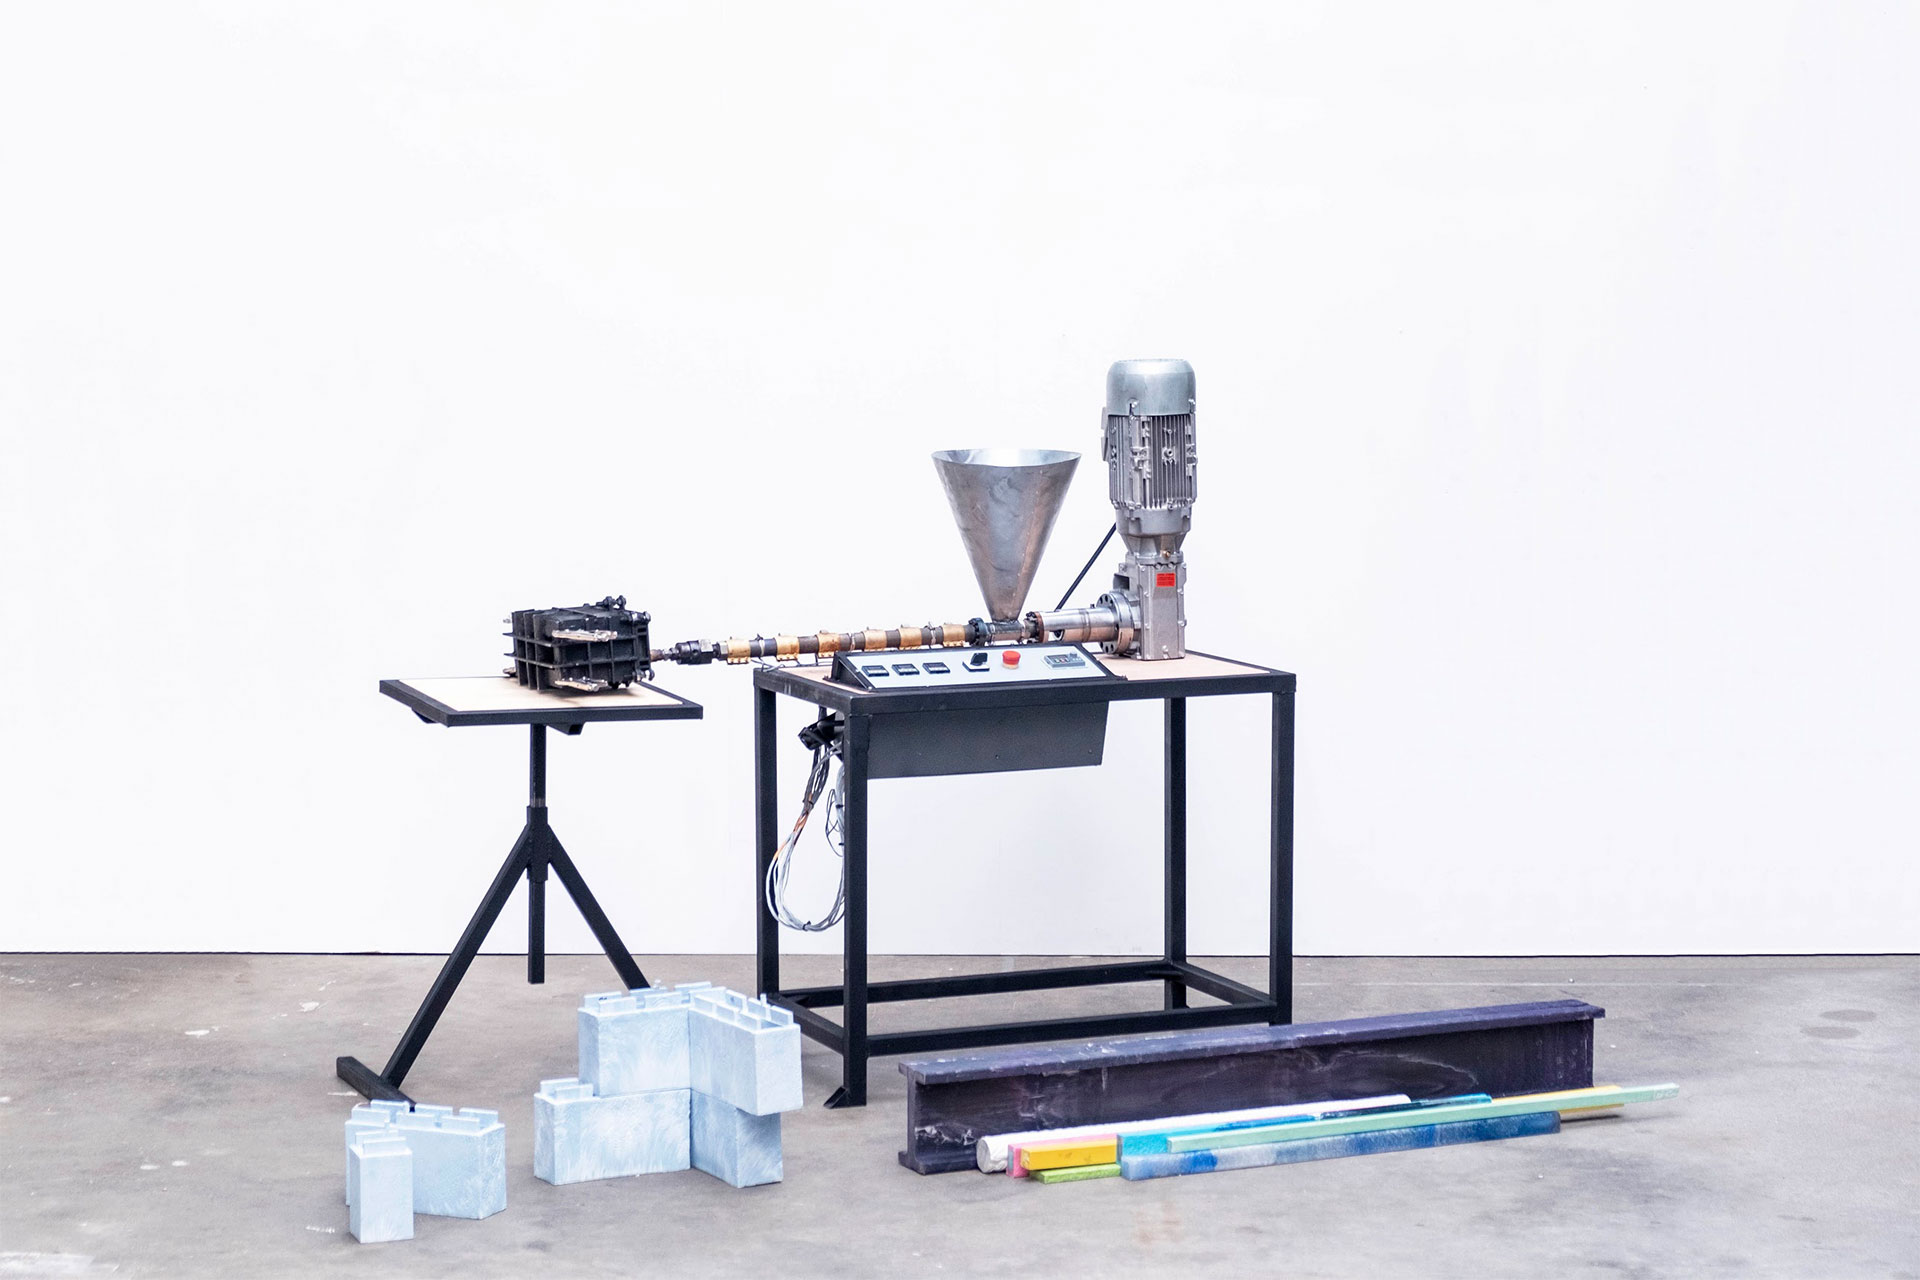 Extrusion machine on white background